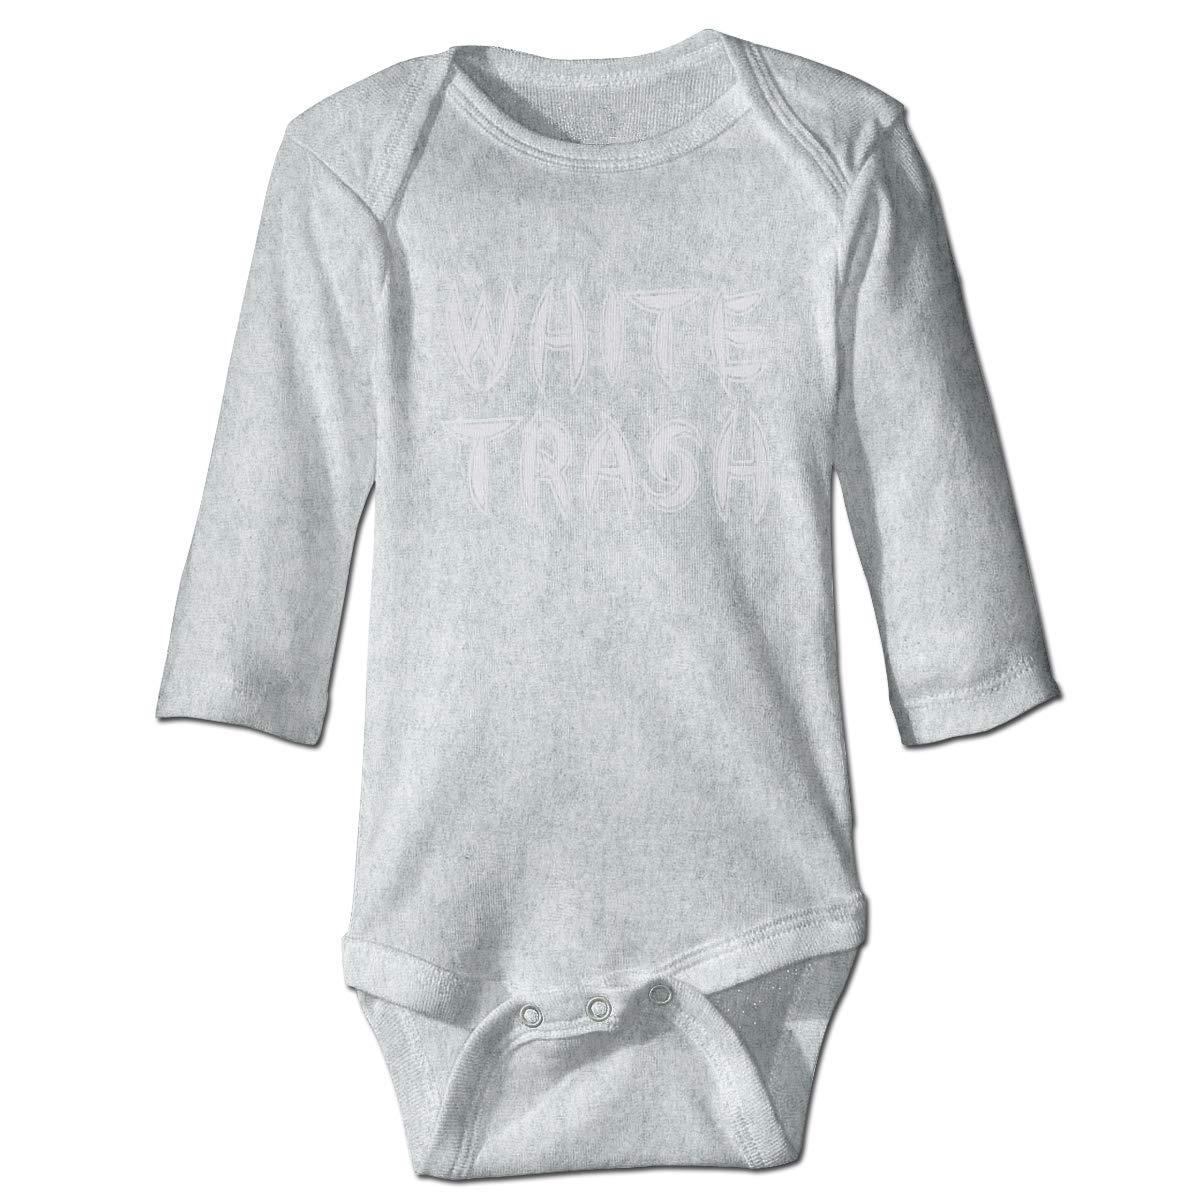 XHX Baby White Trash Long Sleeve Romper Onesie Bodysuit Jumpsuit